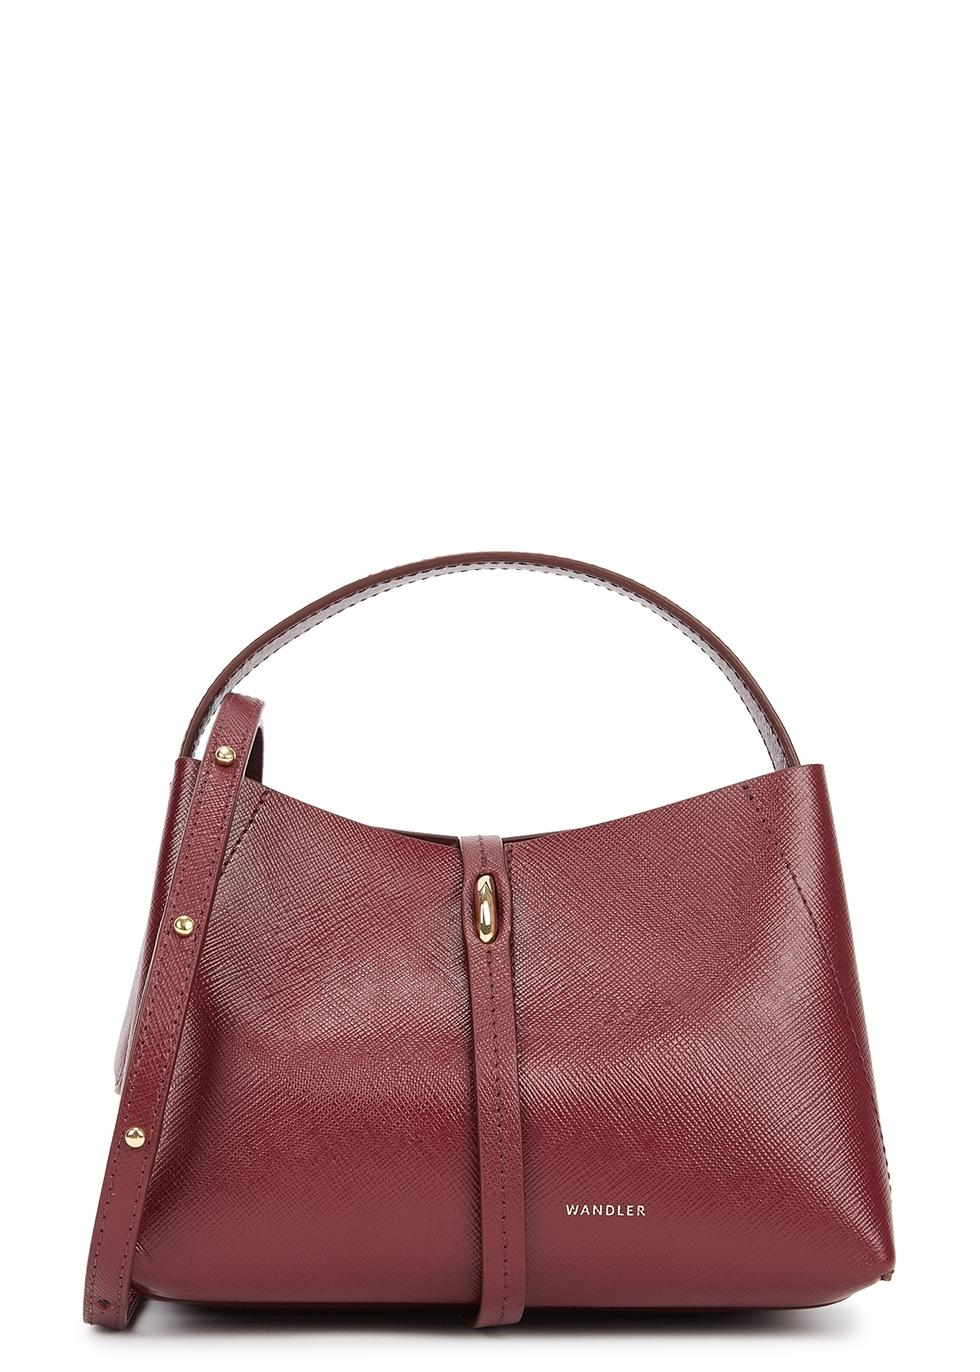 Ava micro burgundy leather top handle bag